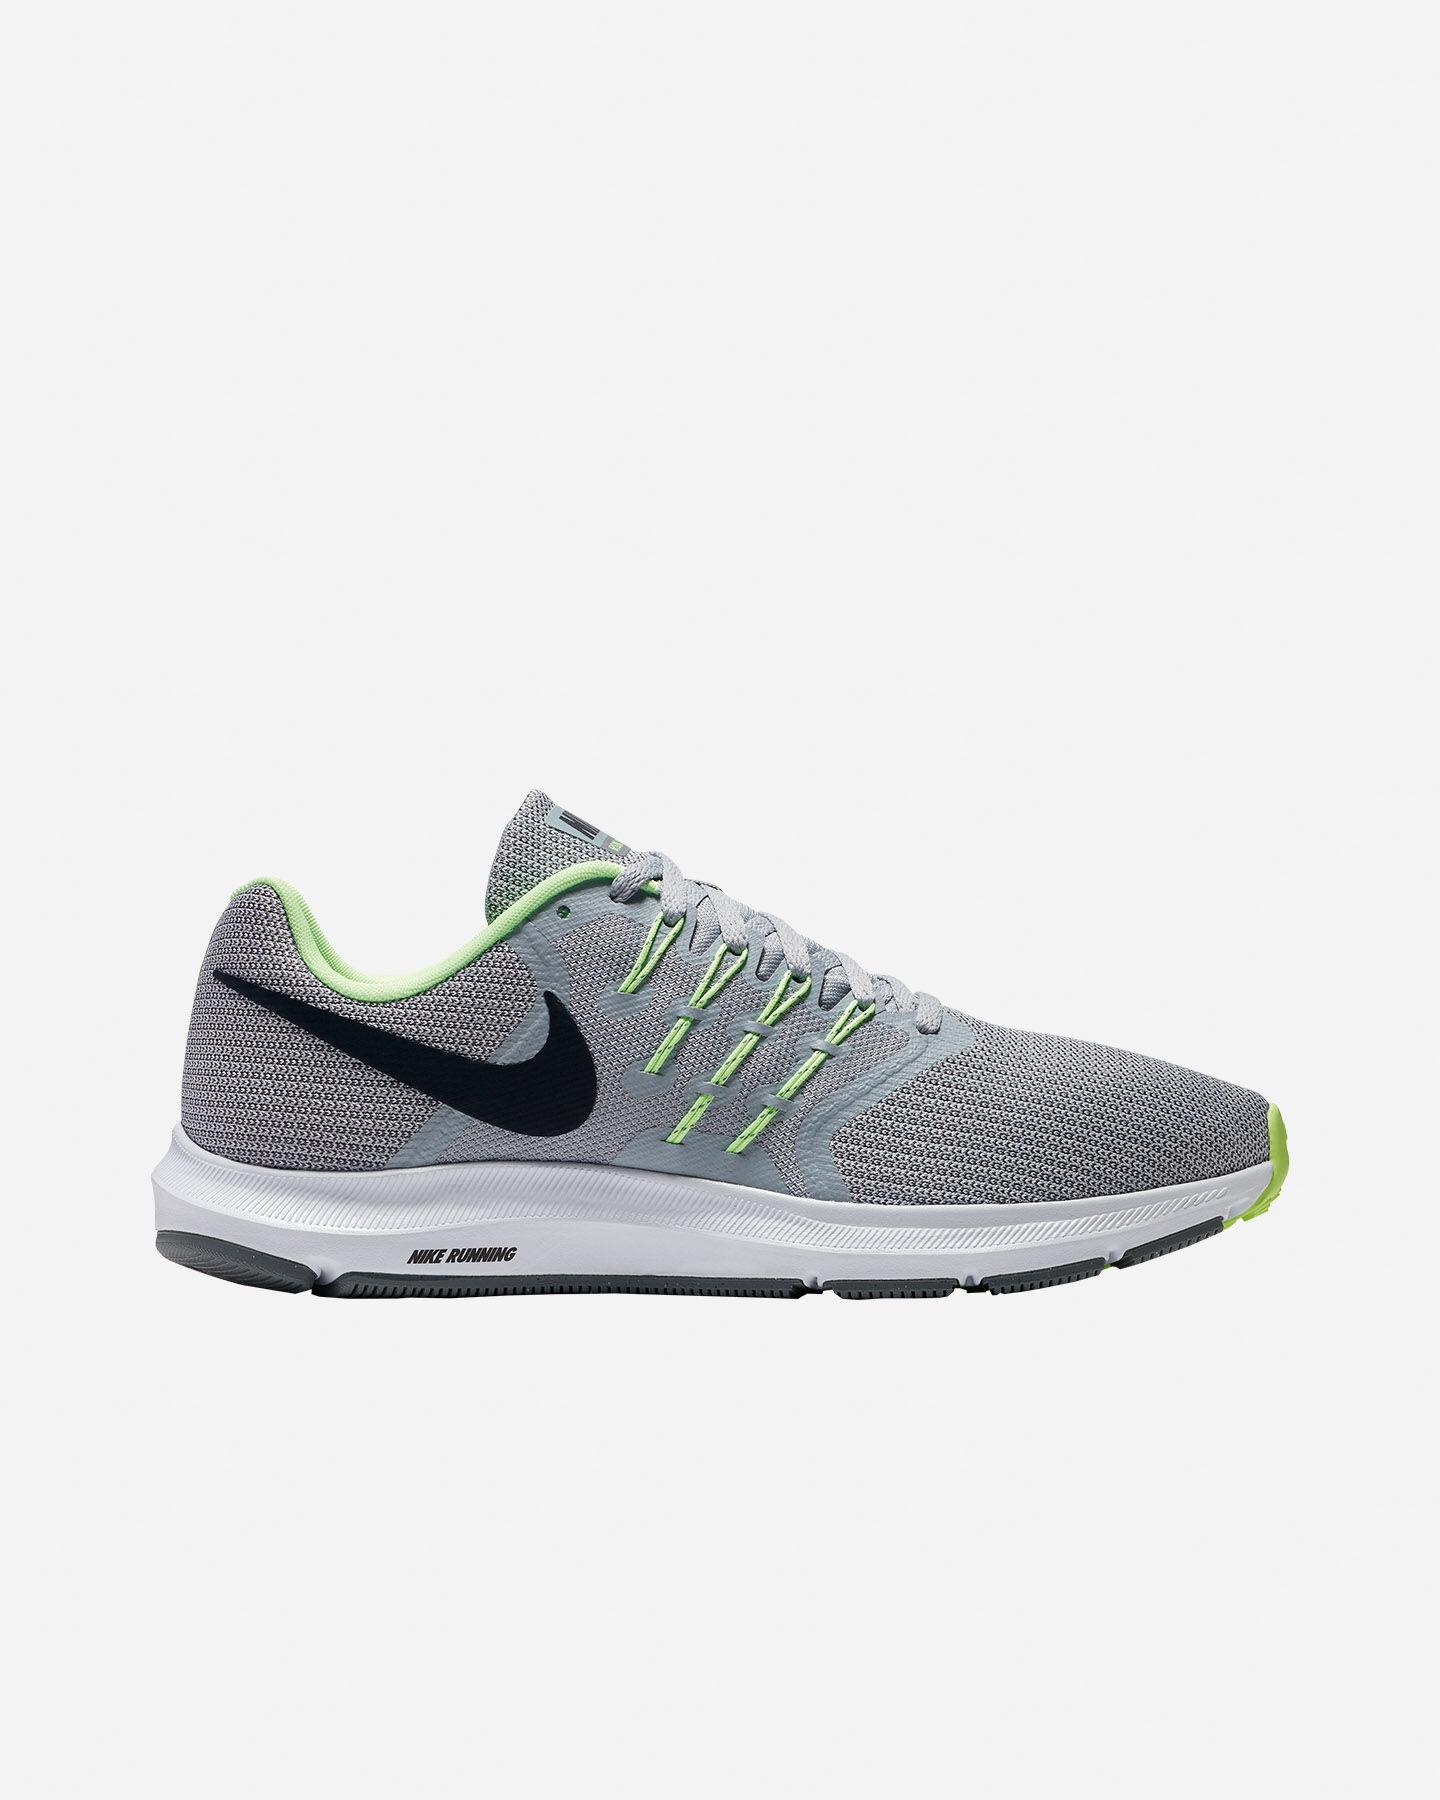 scarpe running nike quale scegliere